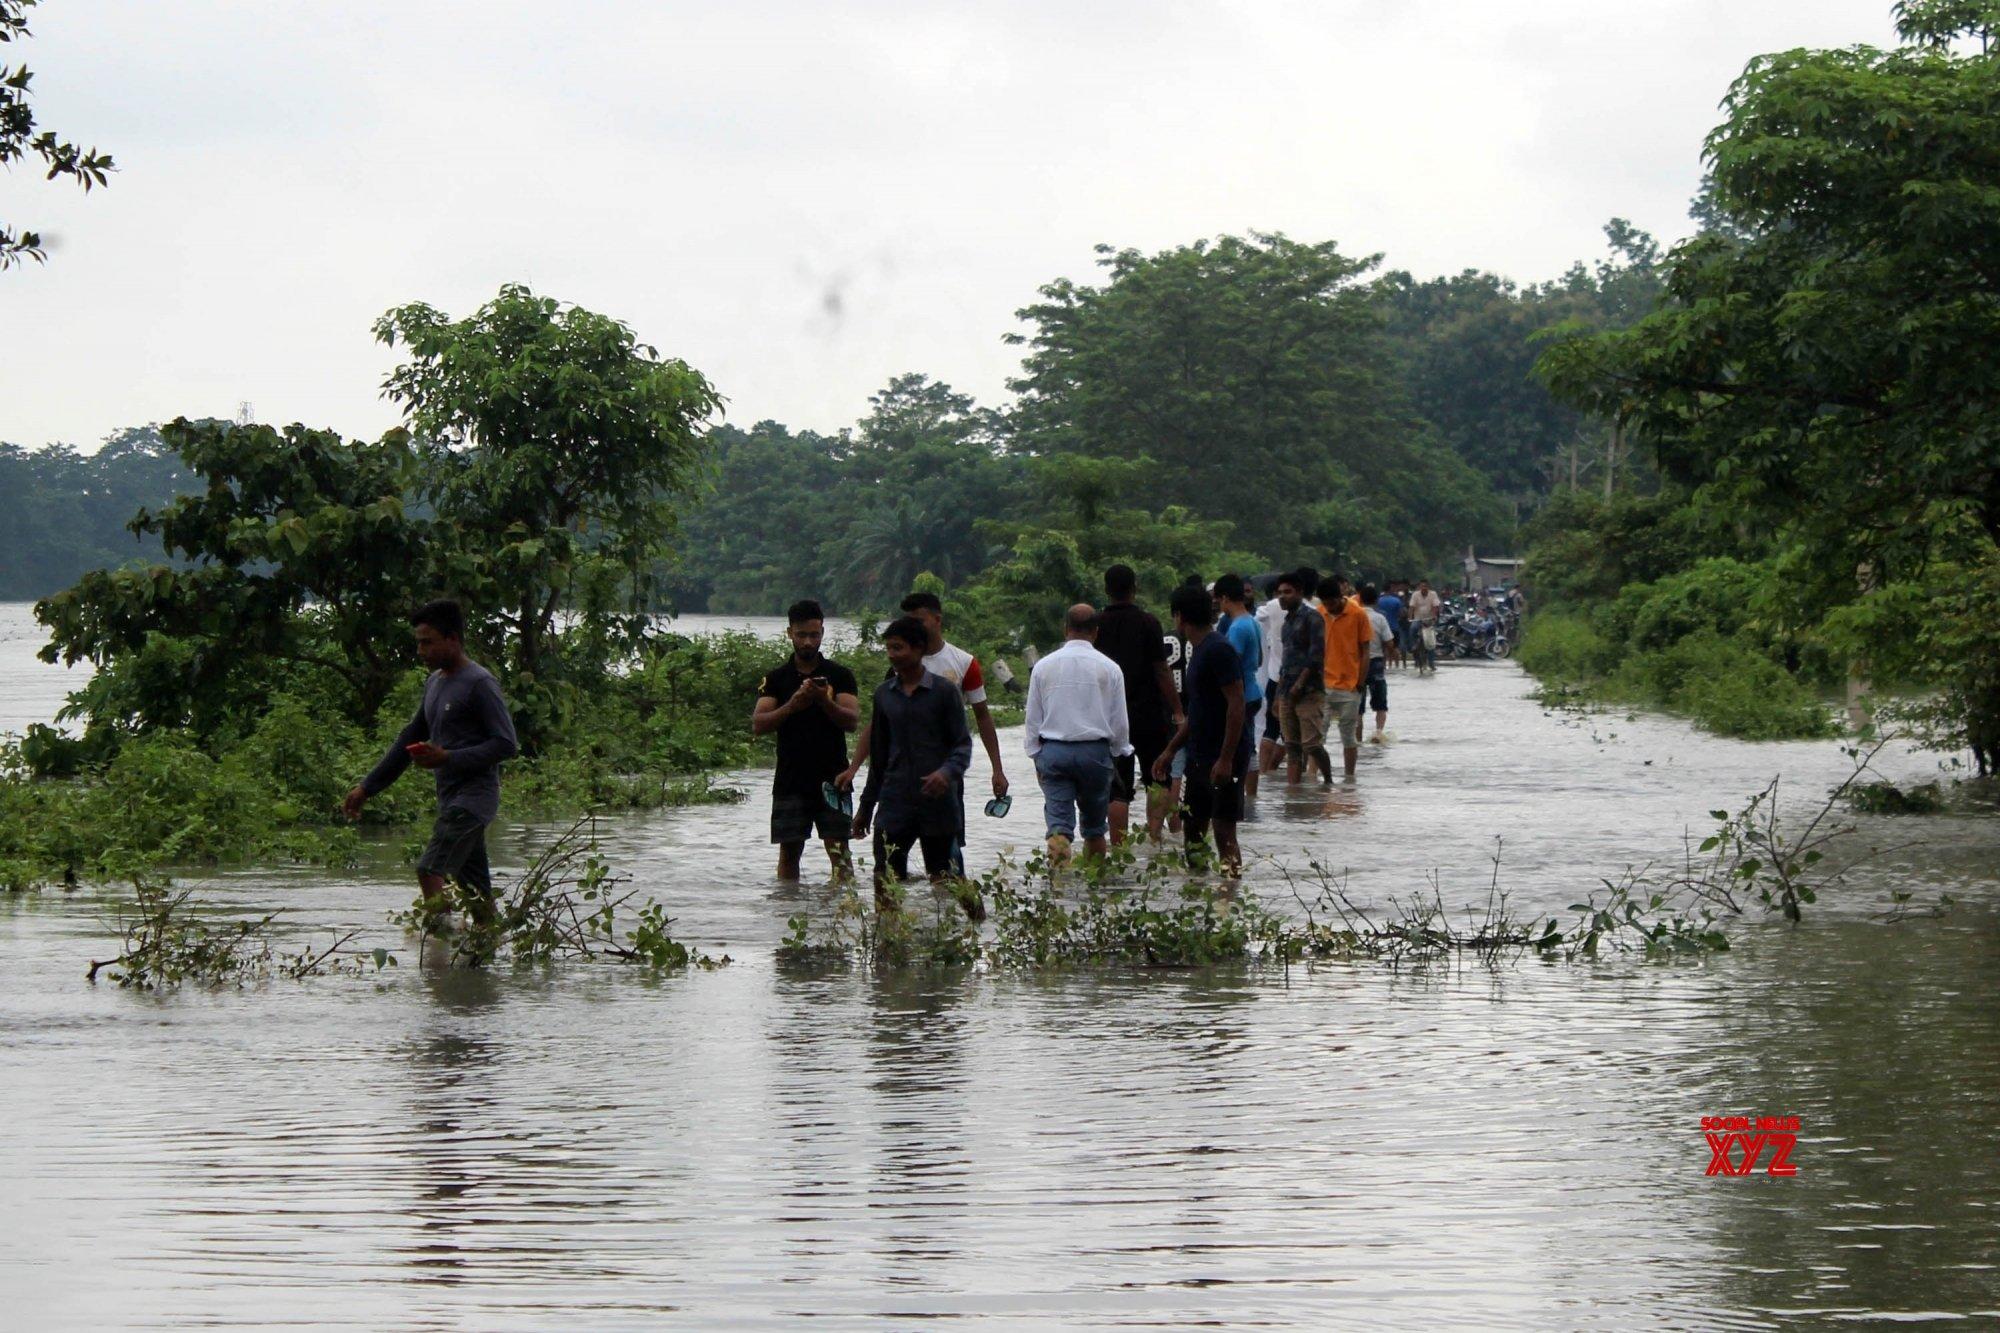 Assam flood situation grim, death toll rises to 6